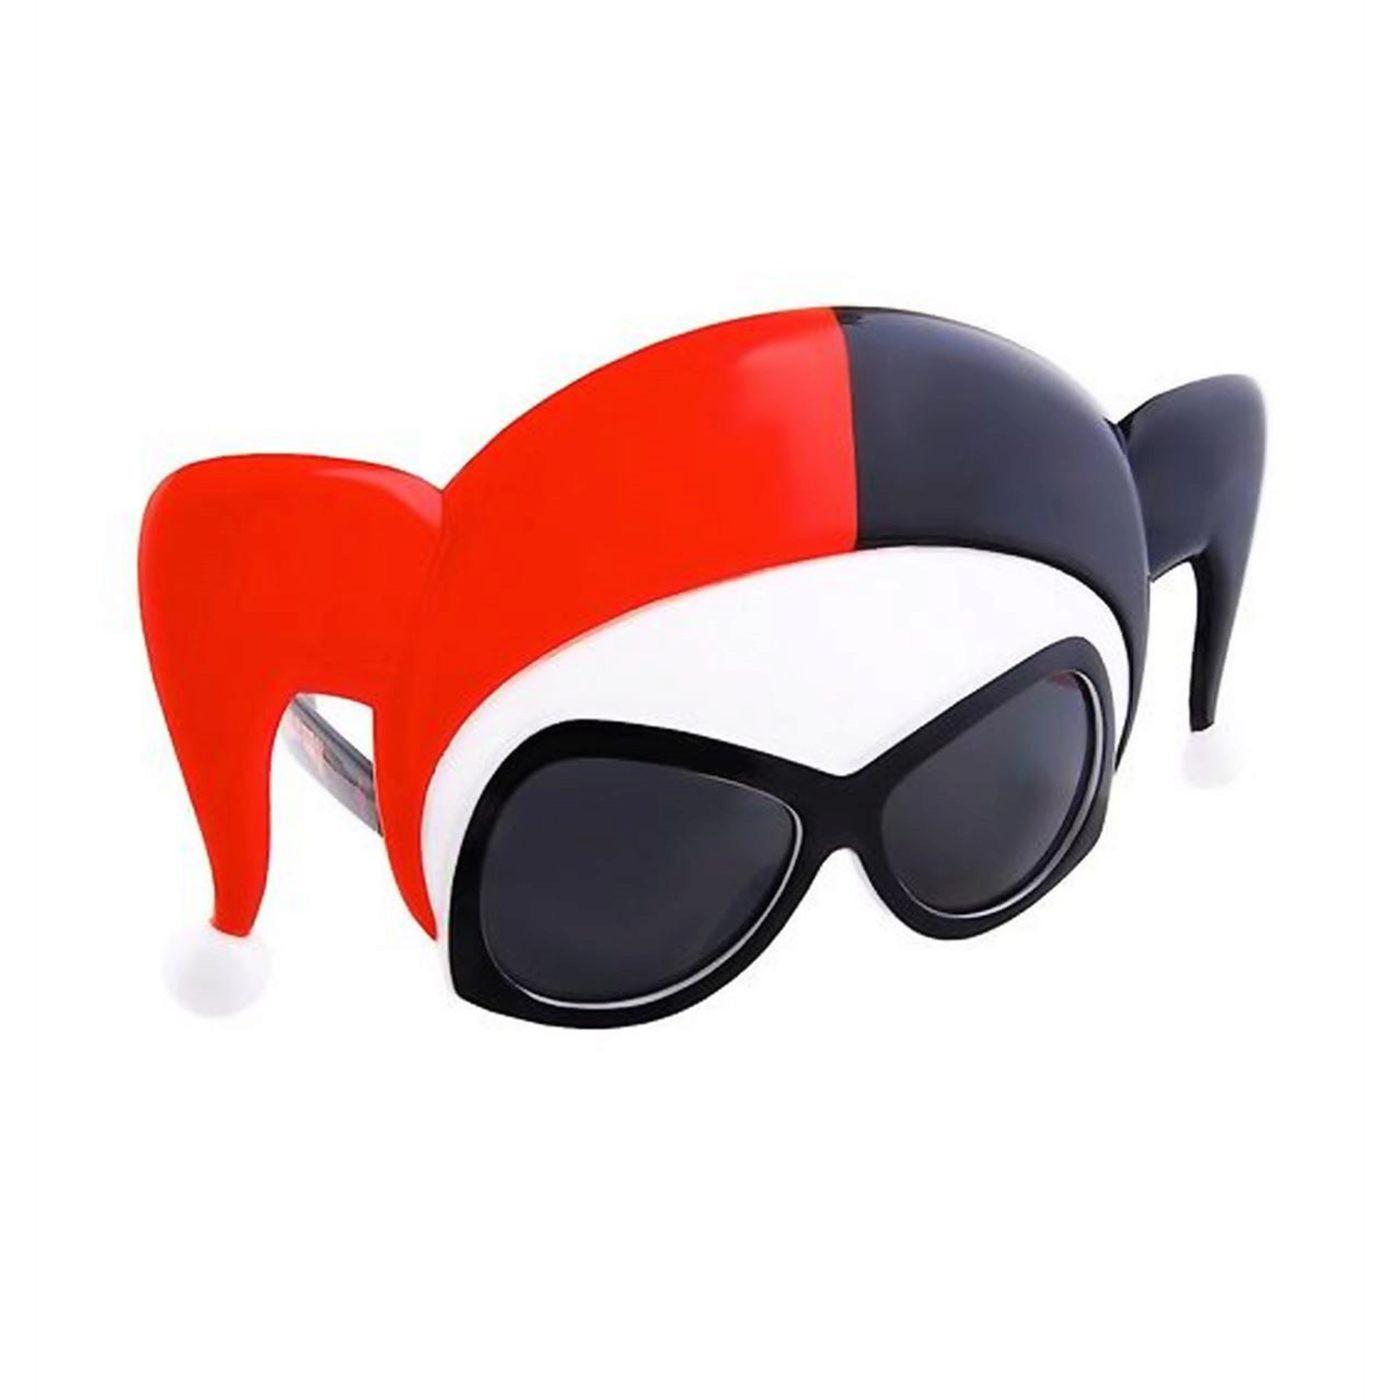 Harley Quinn Mask Costume Sunglasses